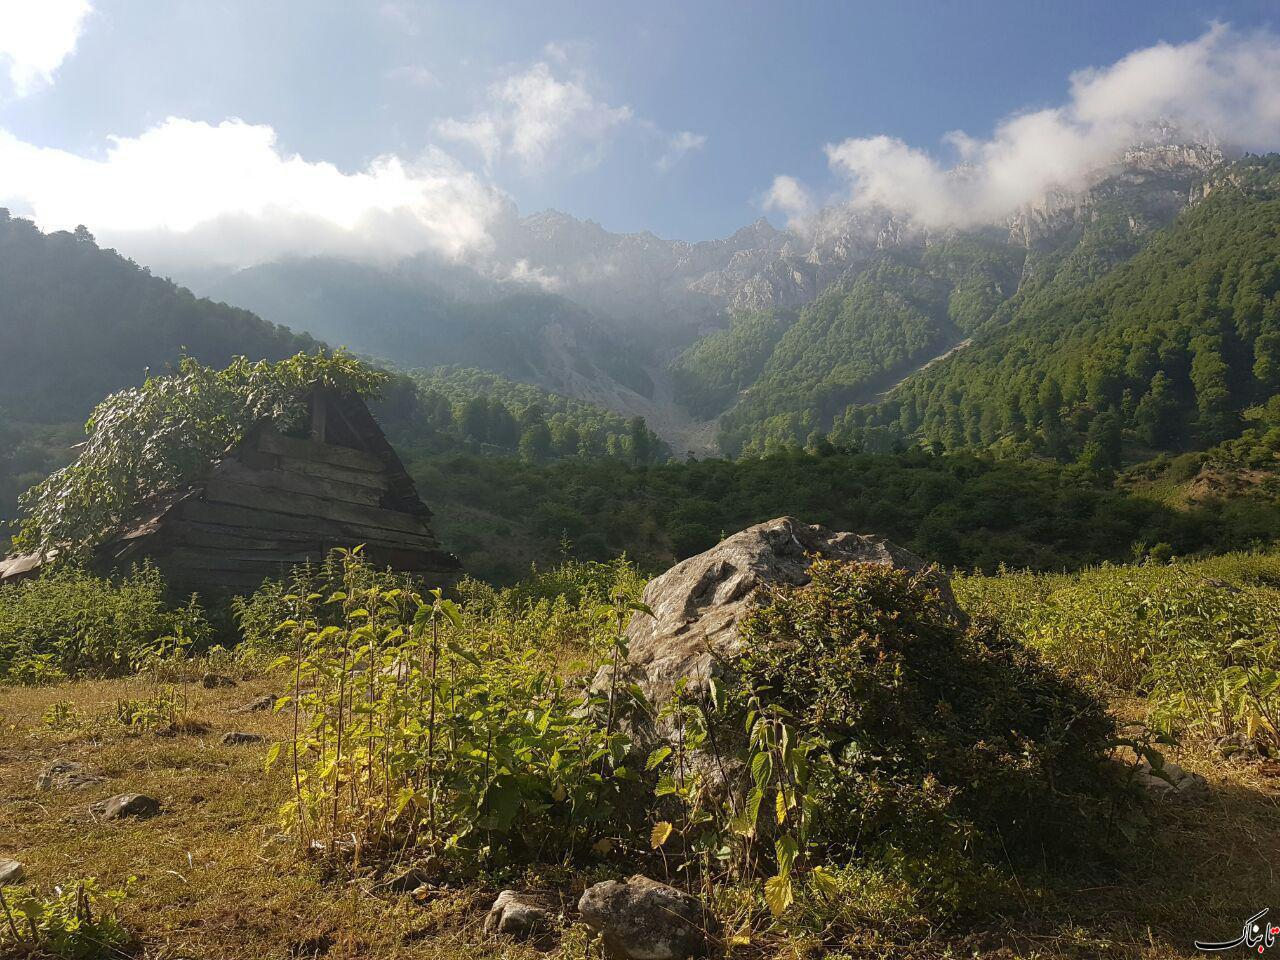 طبیعت روستای برنت - سوادکوه